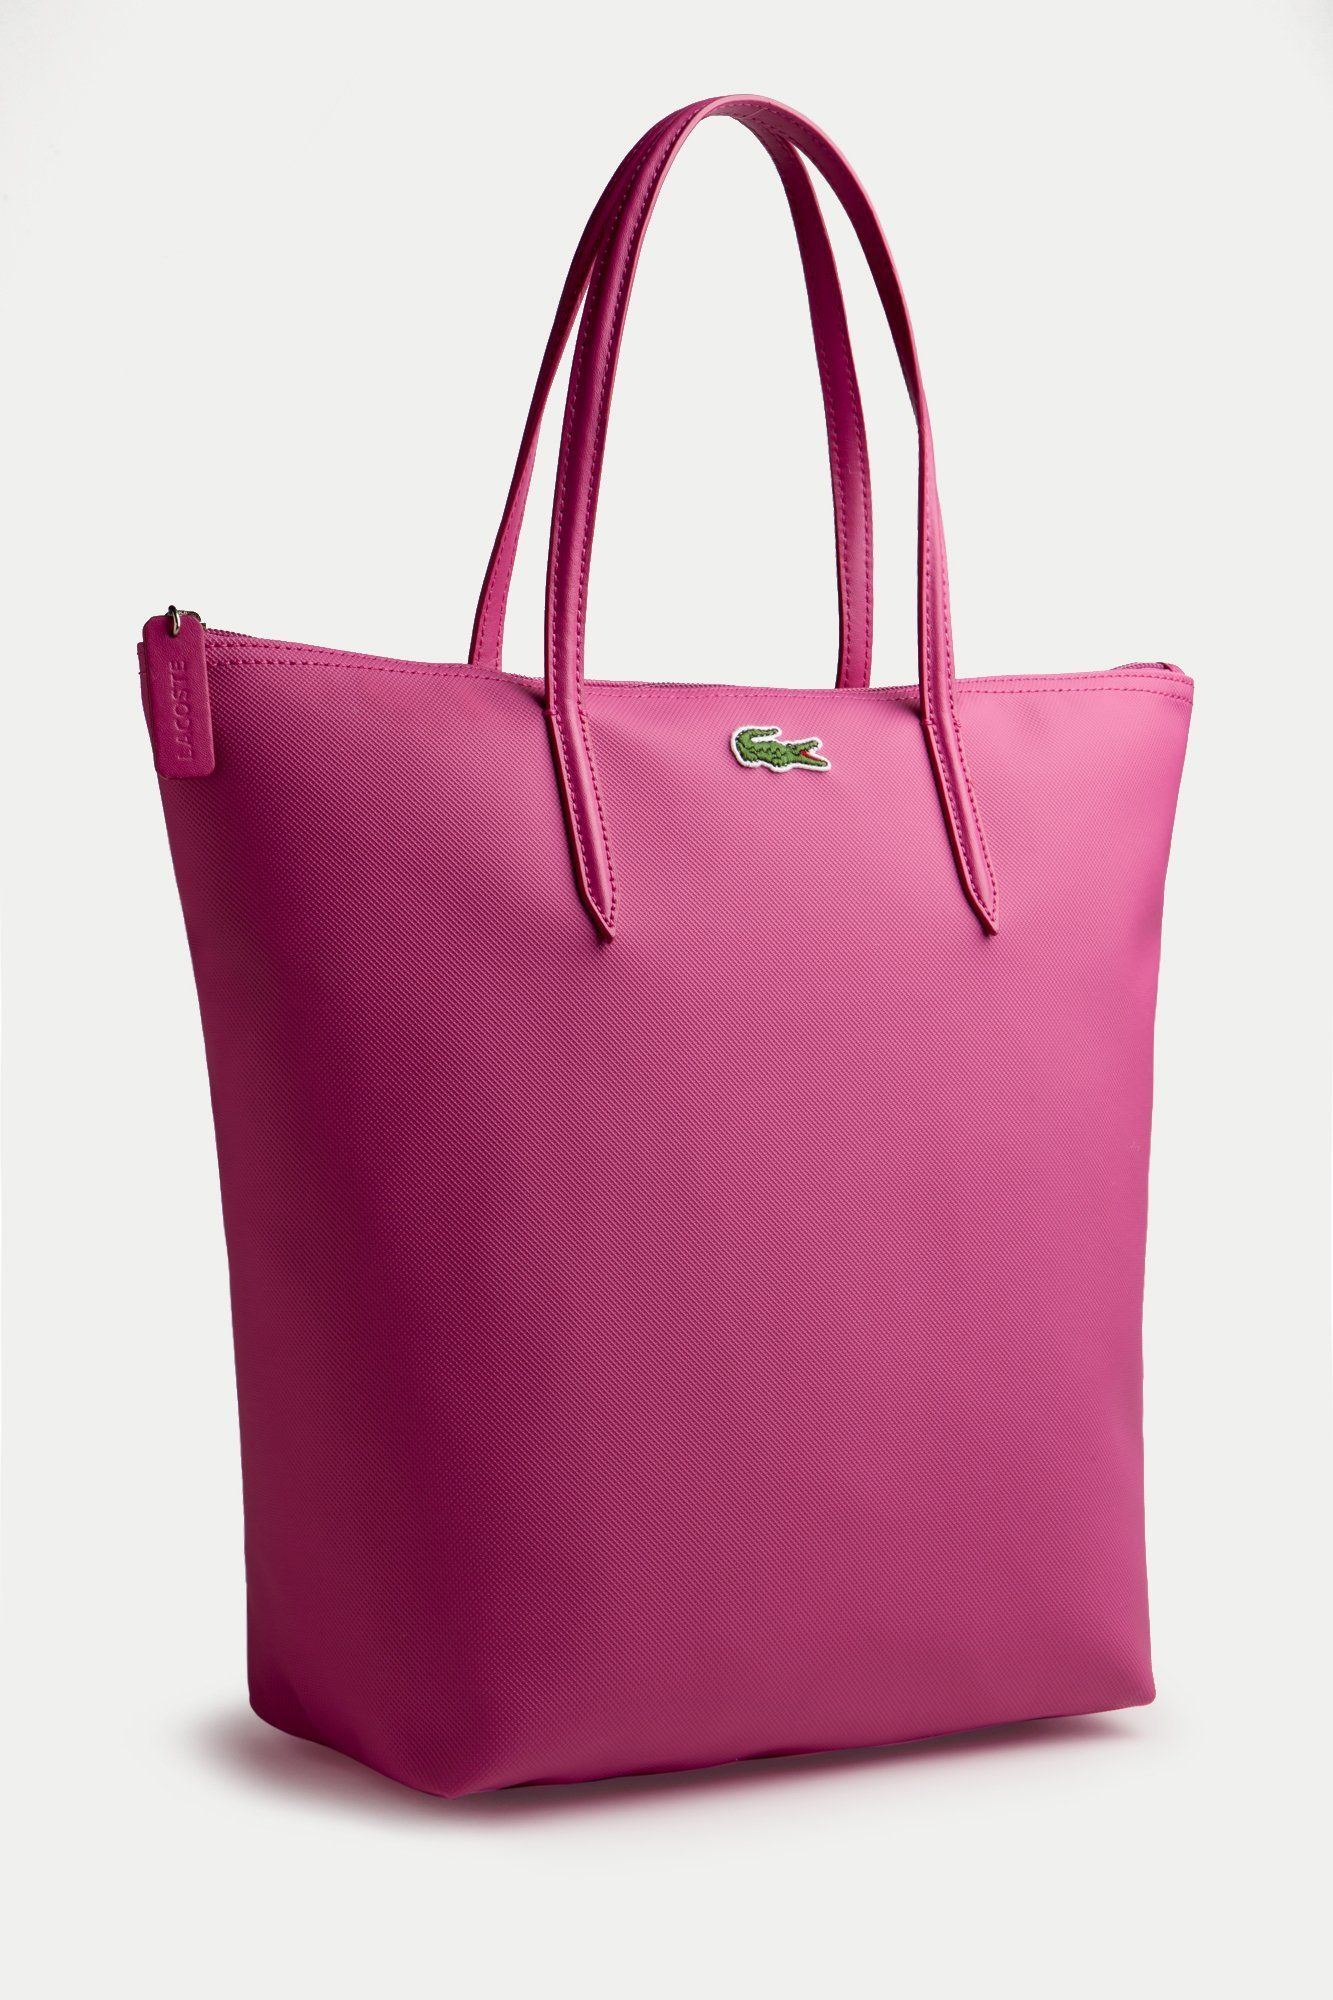 Lacoste L.12.12 Concept Medium Vertical Tote   Bags  56.99  2f33cc49b54